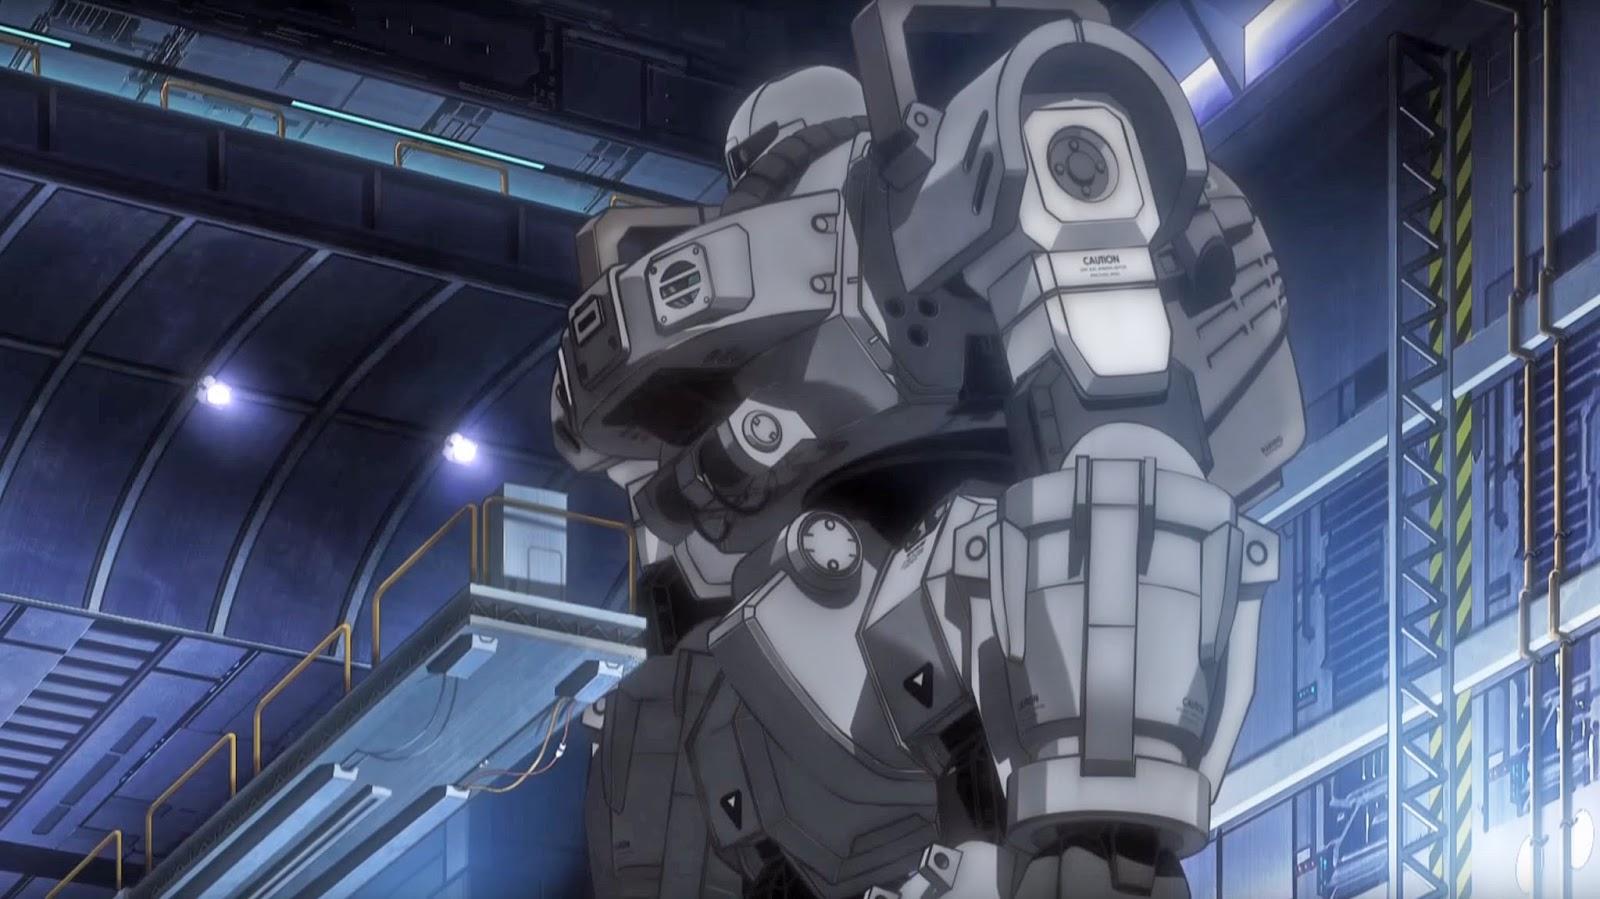 GUNDAM GUY: Mobile Suit Gundam THE ORIGIN III: Dawn of Rebellion - 13 Mins Streaming Video Updated!